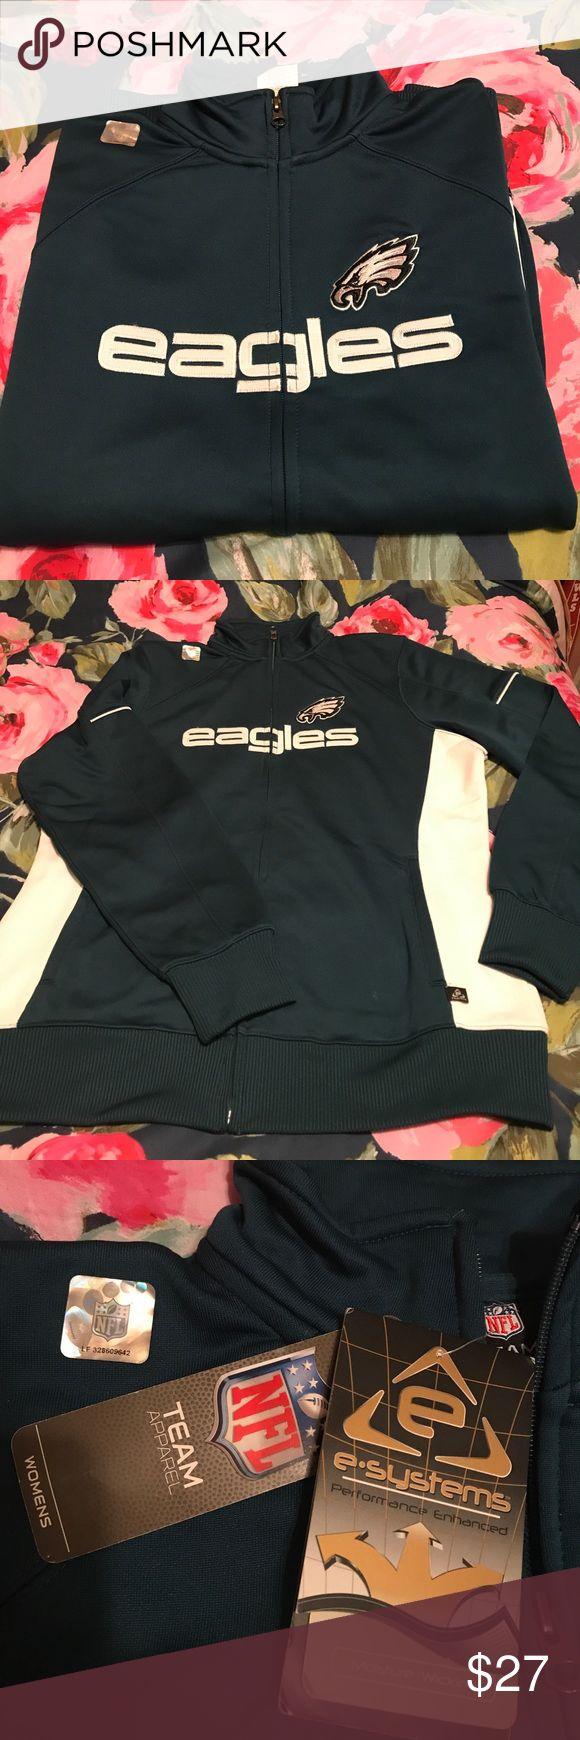 Philadelphia Eagles Zip Up NFL Team Apparel Eagles moisture wicking zip up. Tops Sweatshirts & Hoodies